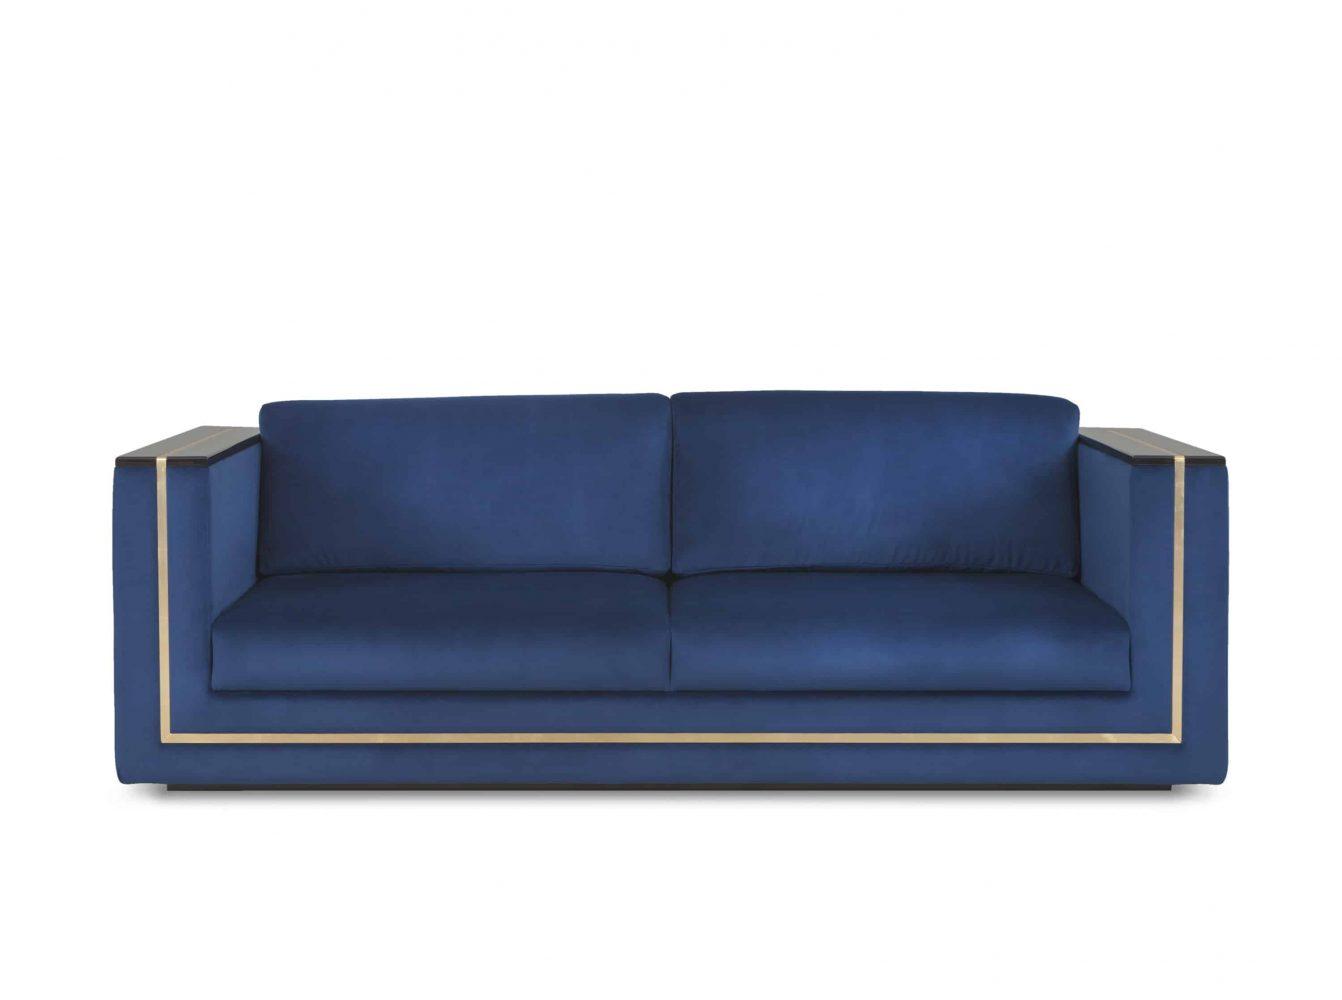 Plathea-G703028-Sofa-S-01